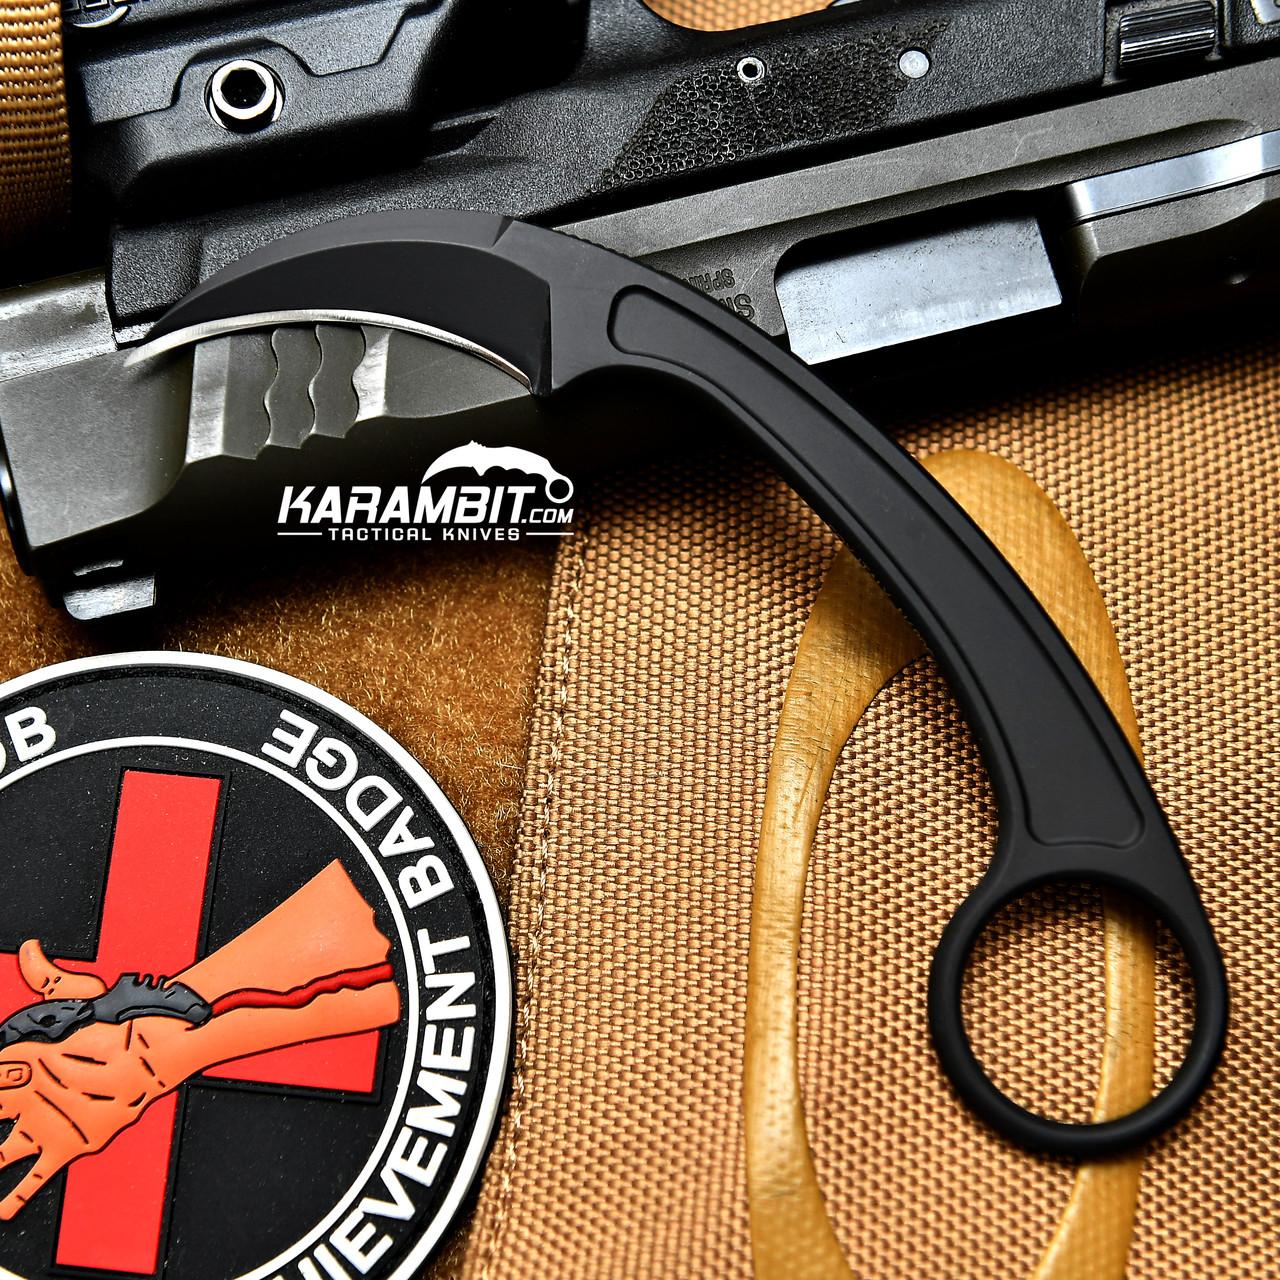 Bastinelli Knives Pika Black Fixed Karambit Karambit Com